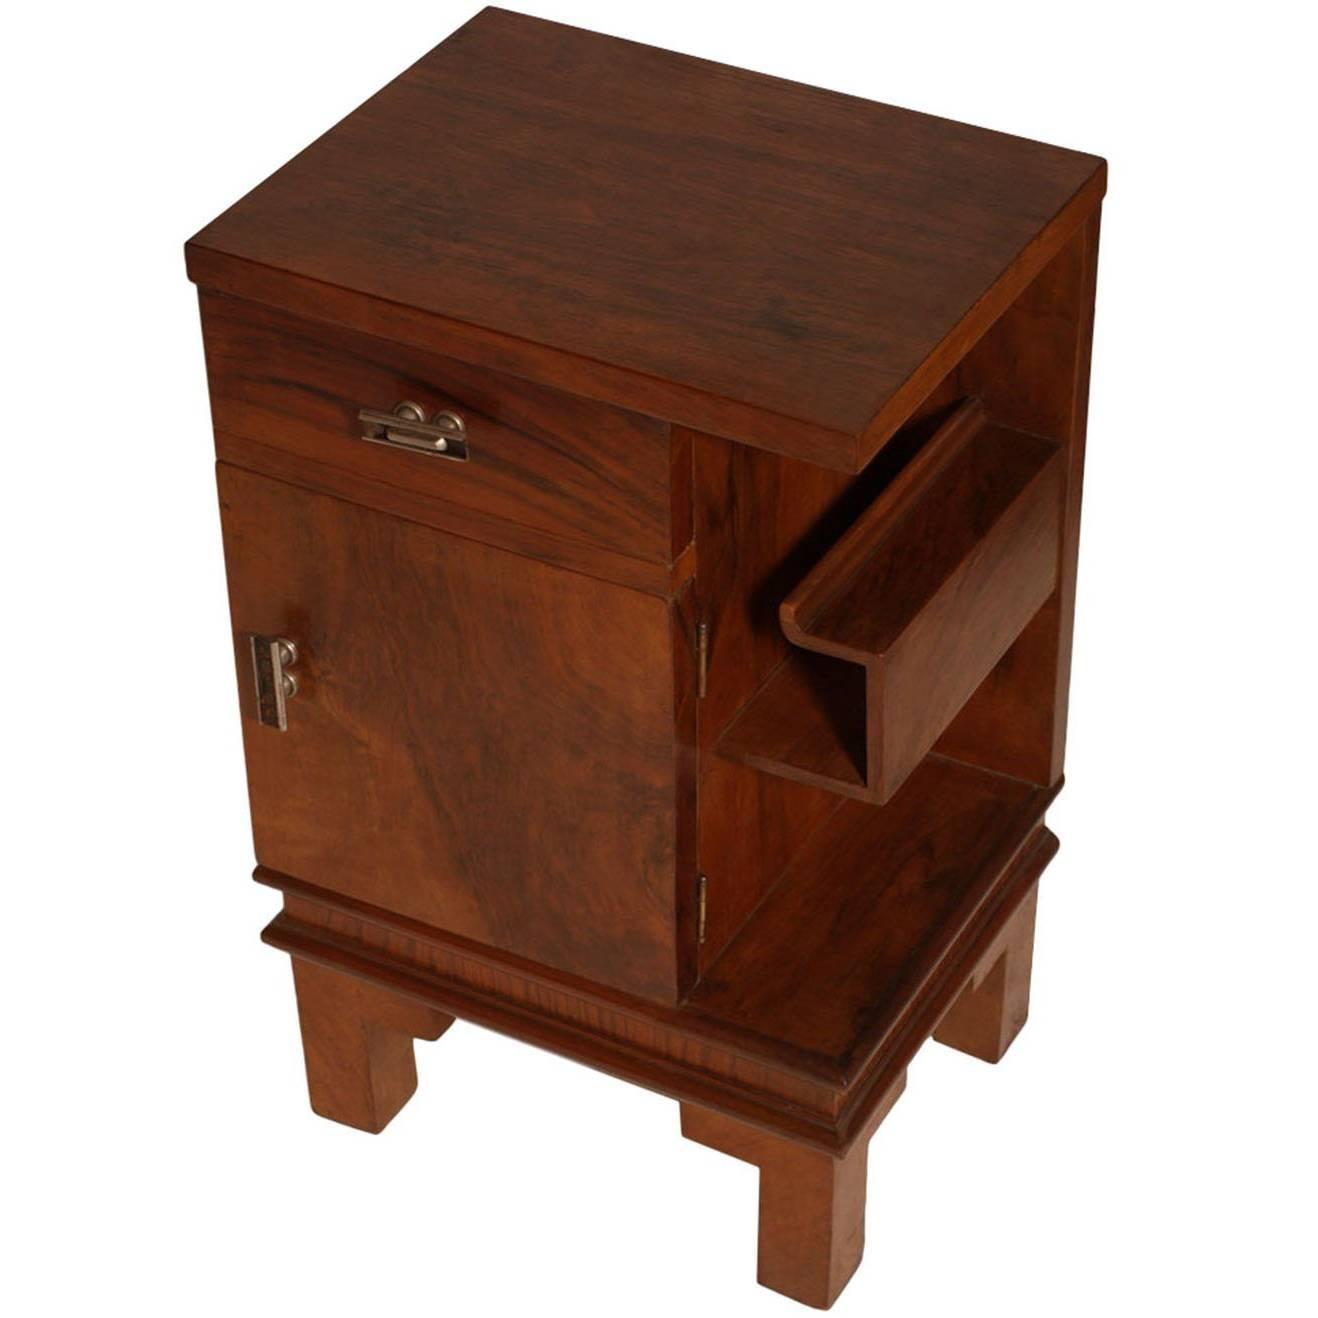 Art Deco Cabinet Nightstand in Walnut, Burl Walnut Osvaldo Borsani Attributed